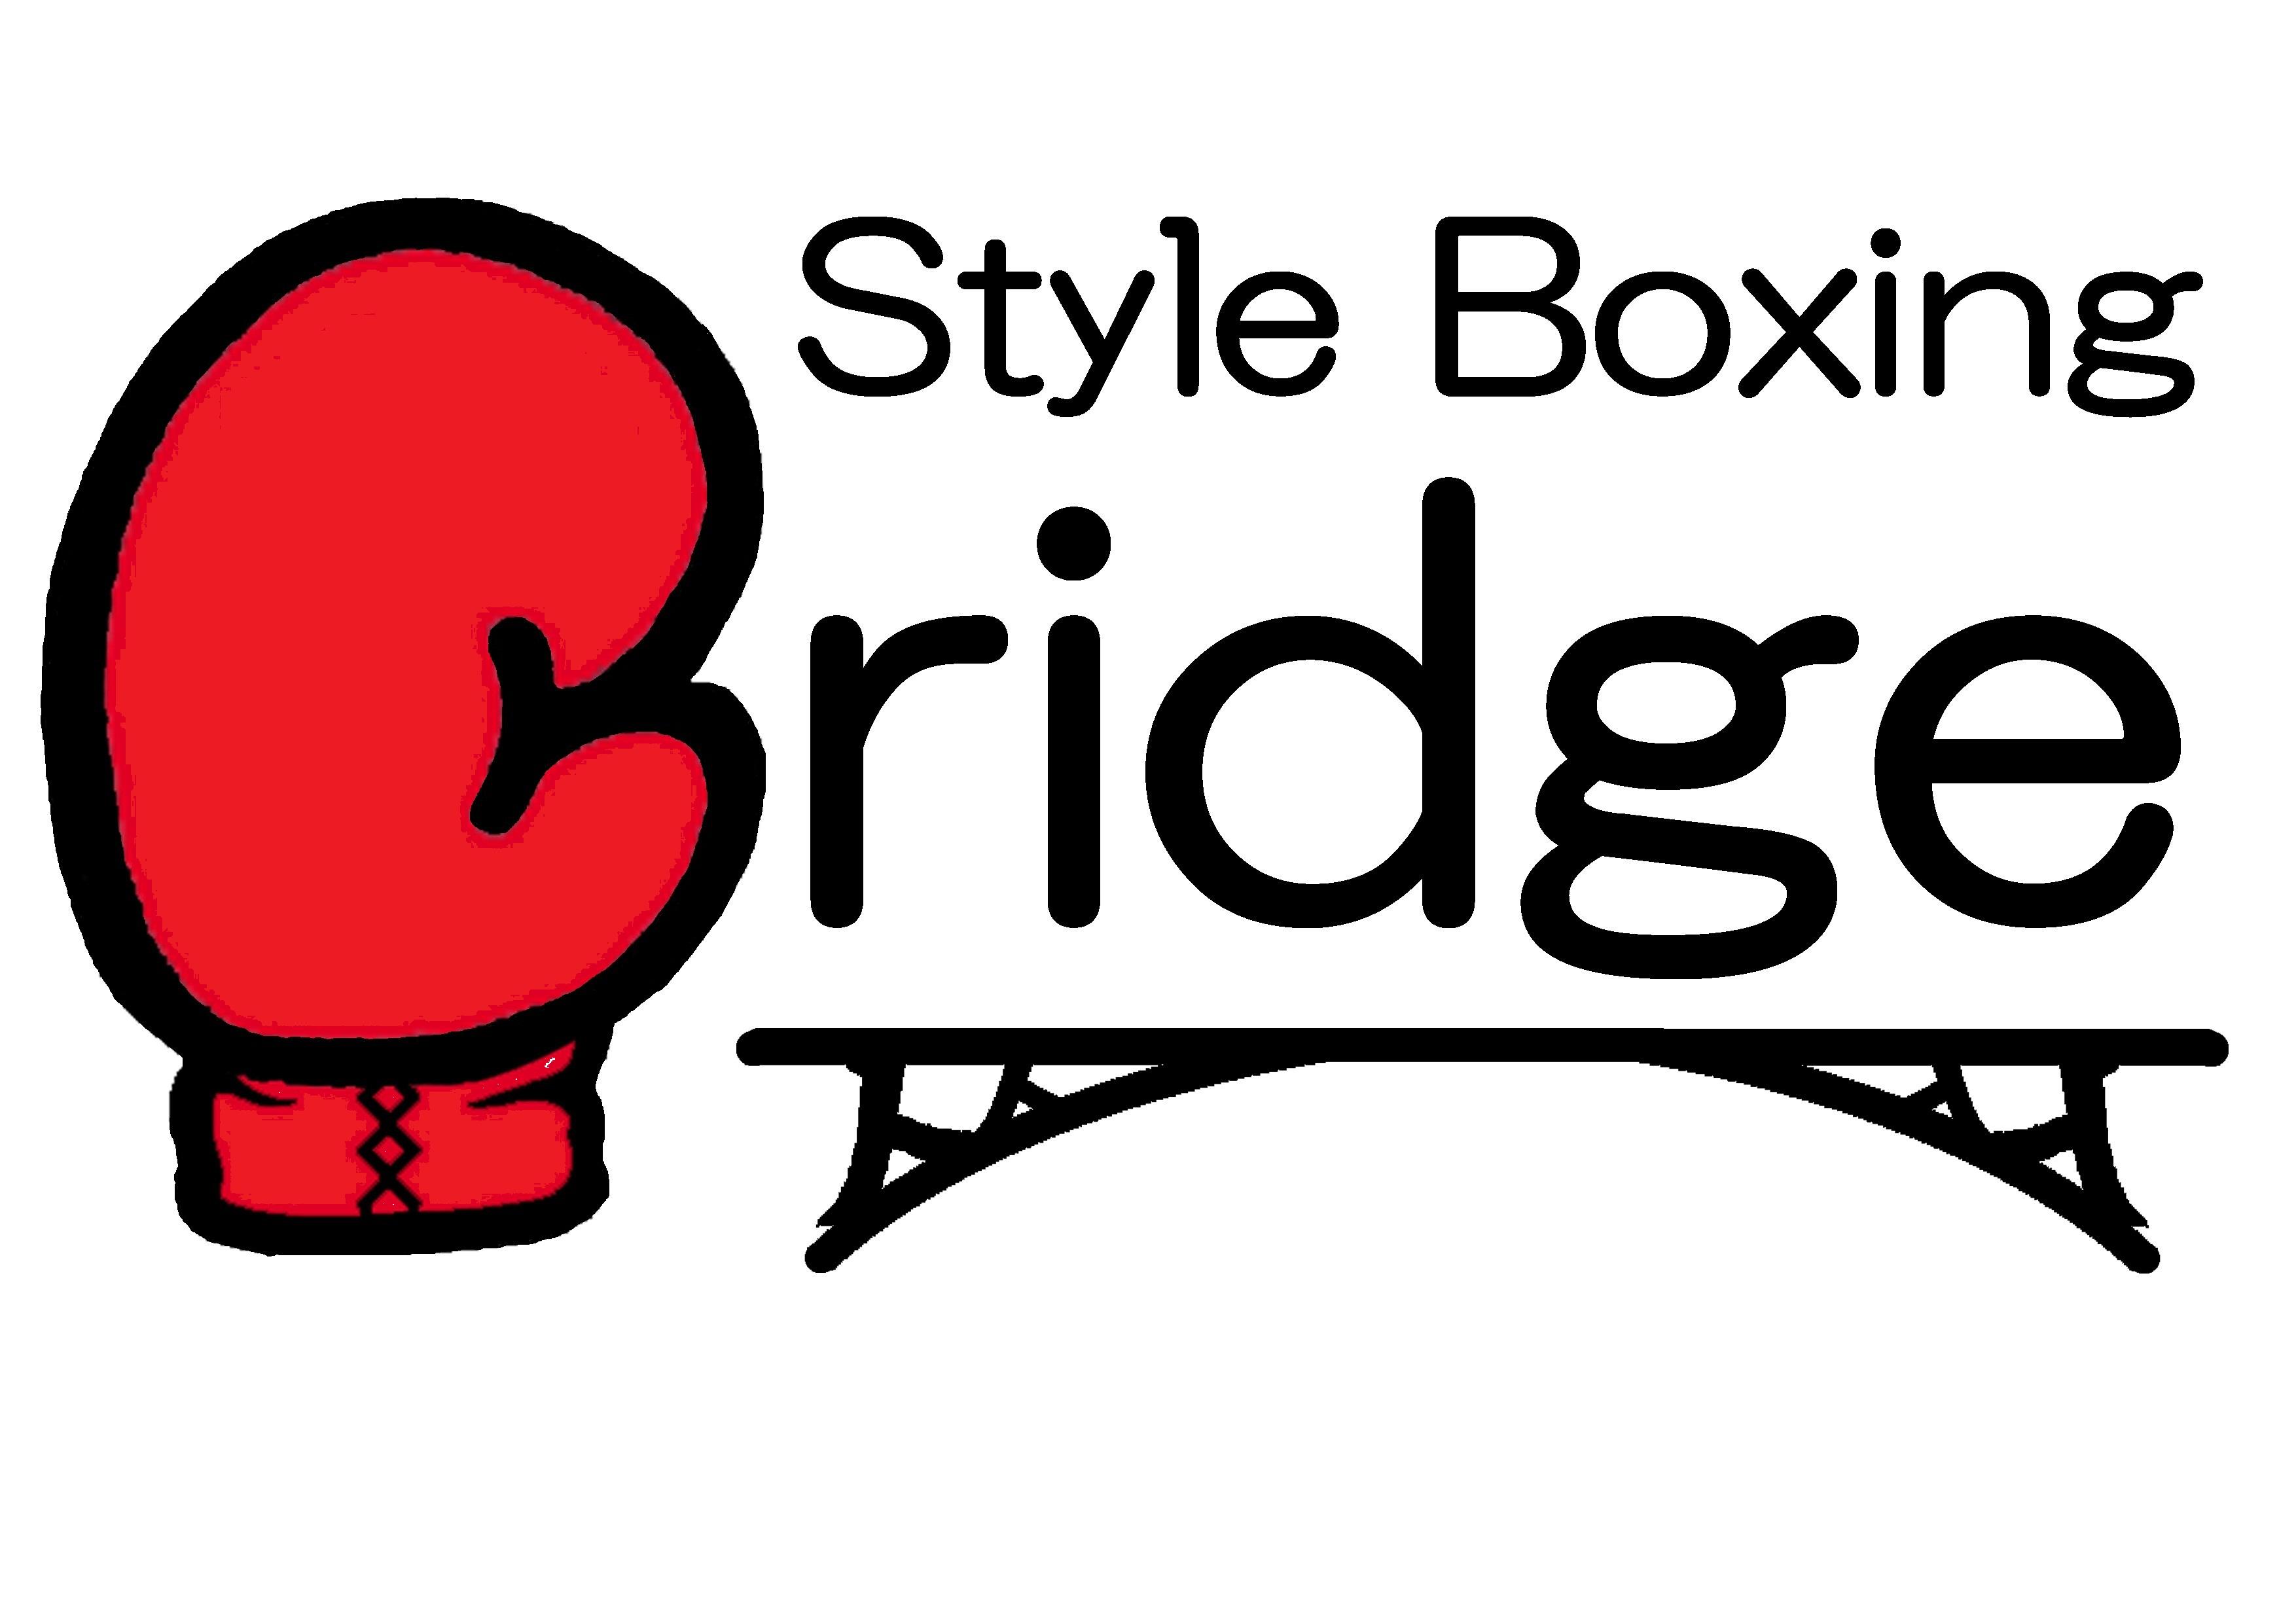 styleboxingブリッジのオリジナル商品